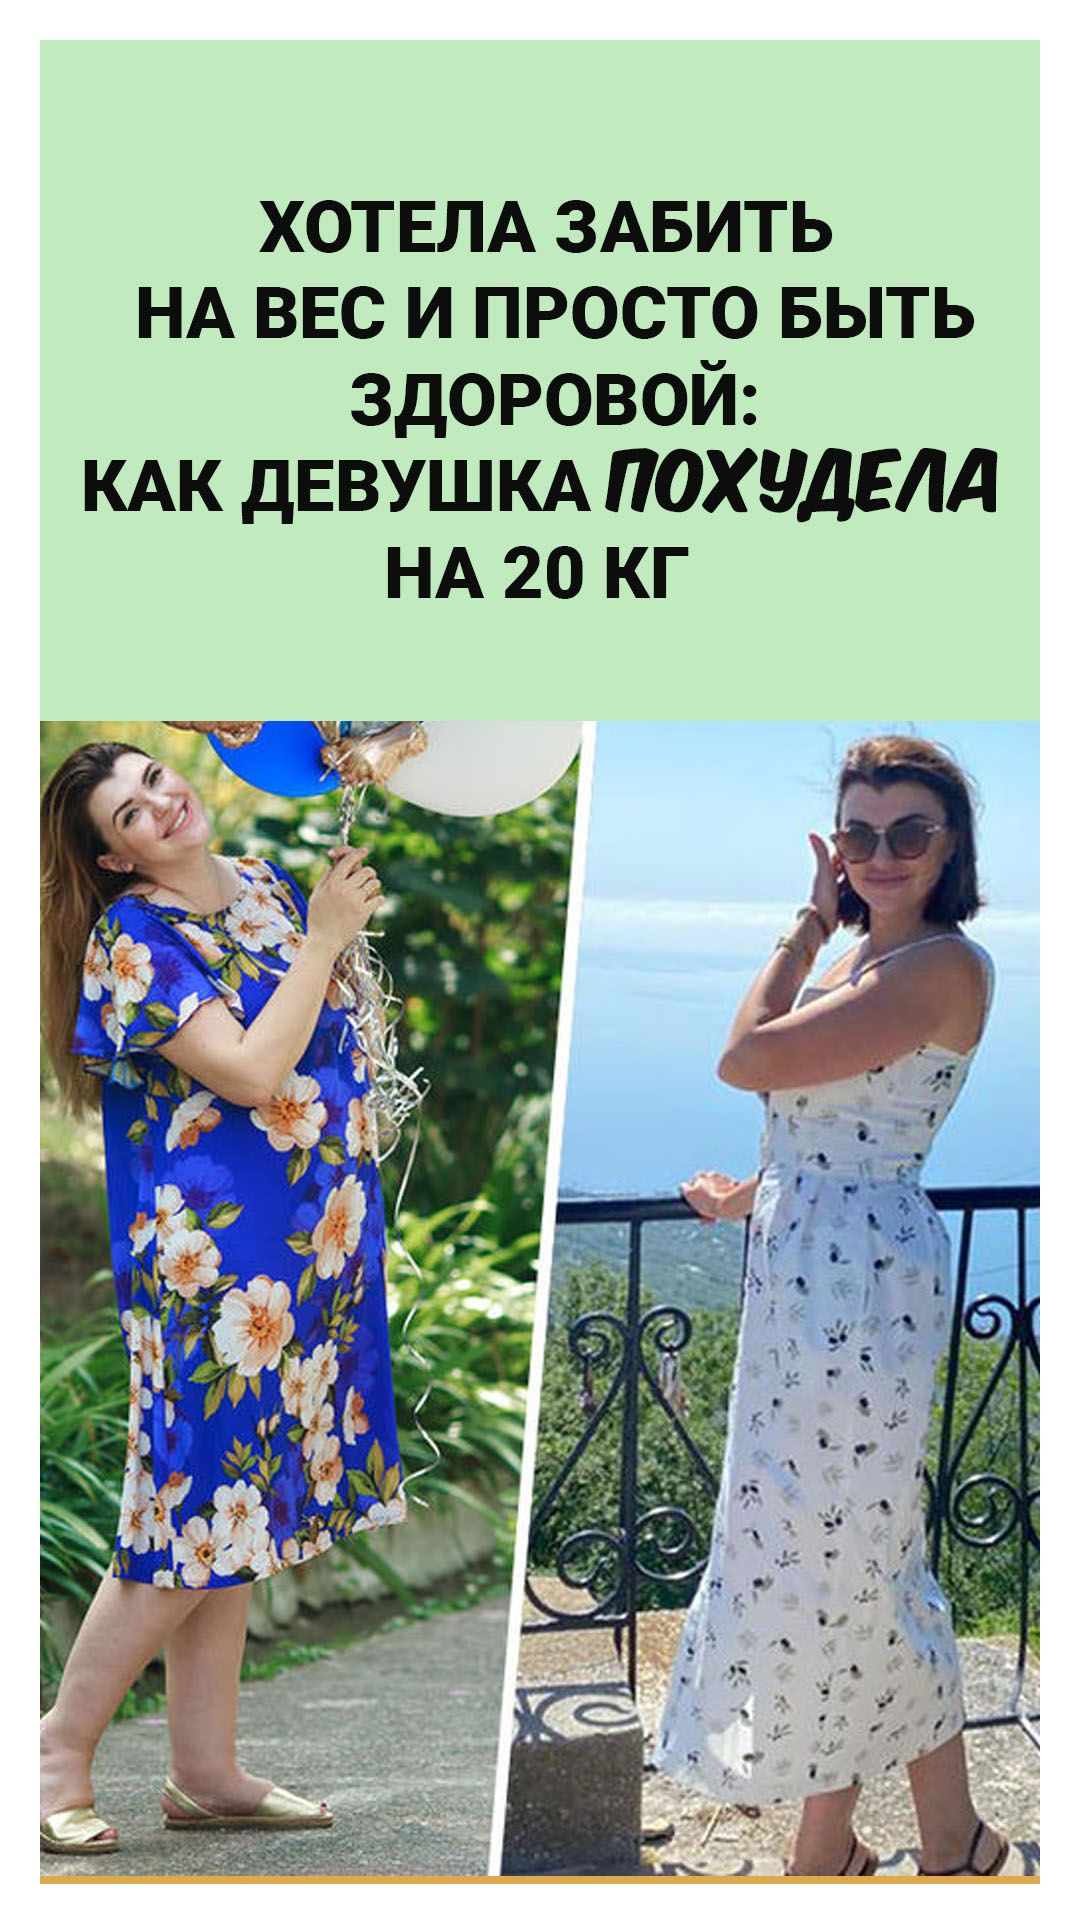 Hotela Zabit Na Ves I Prosto Byt Zdorovoj Kak Devushka Pohudela Na 20 Kg V 2020 G Pohudenie Dieta Sport